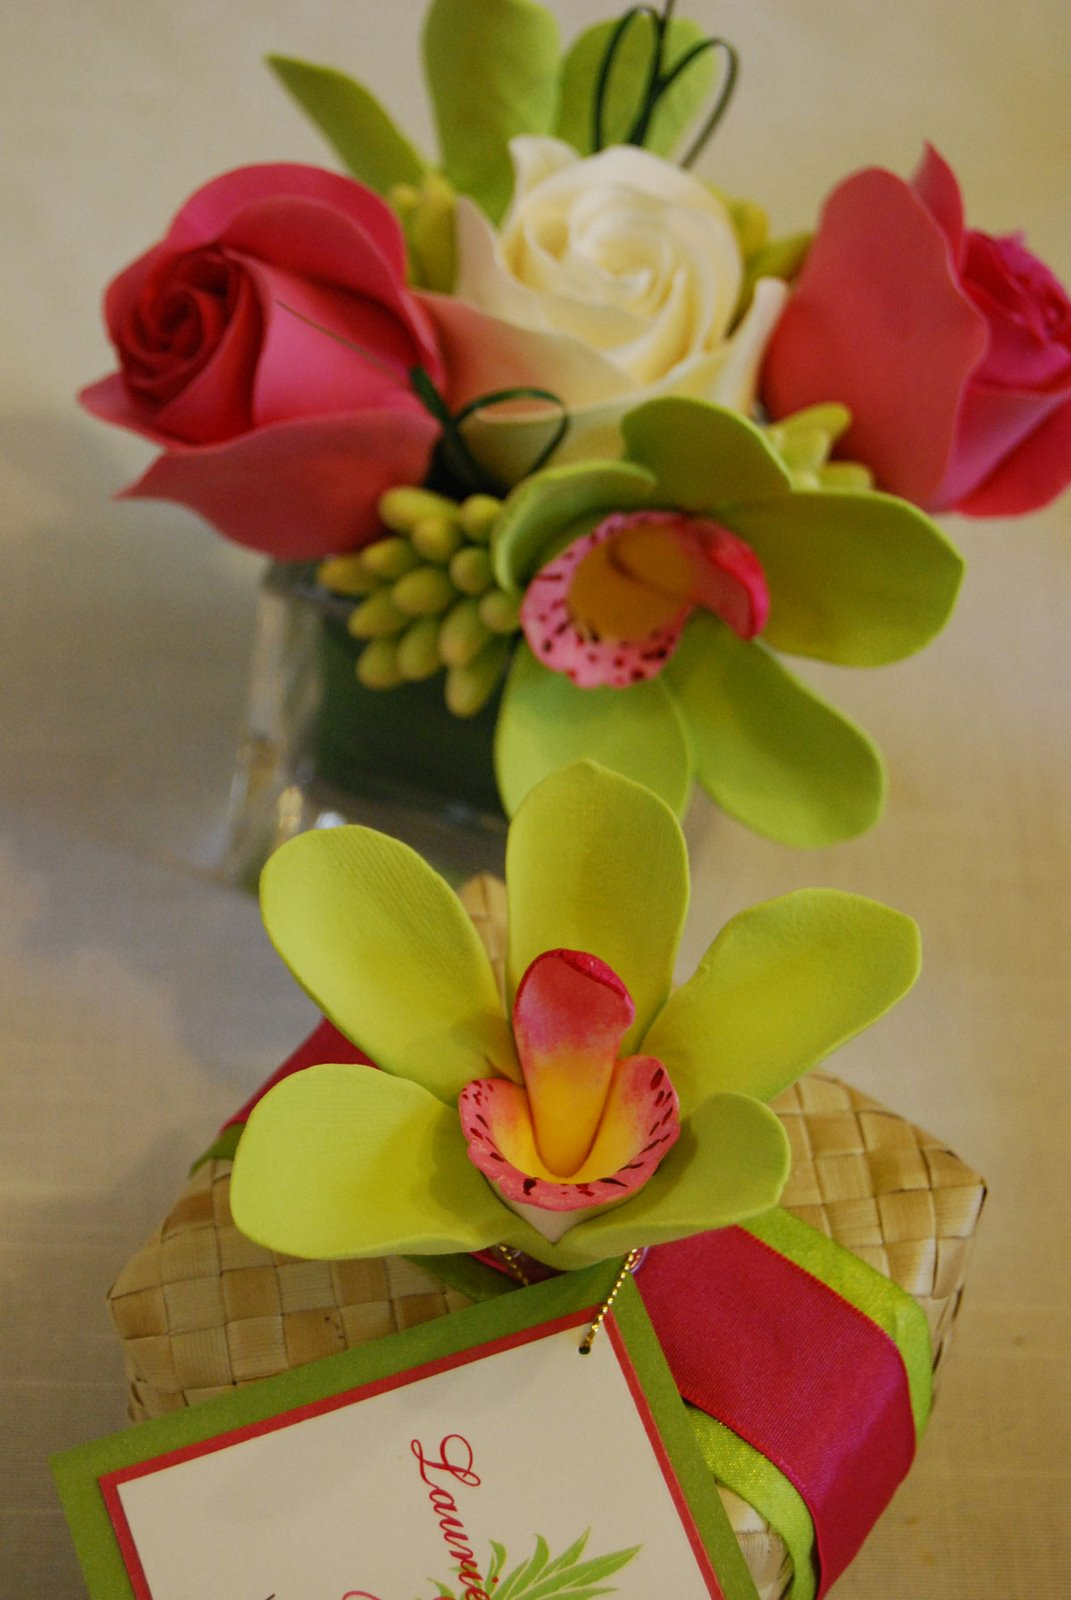 Wedding Gifts For Hawaii : -Friendly Market: Hawaiian Weddings, Lauhala Boxes, Hawaiian Wedding ...